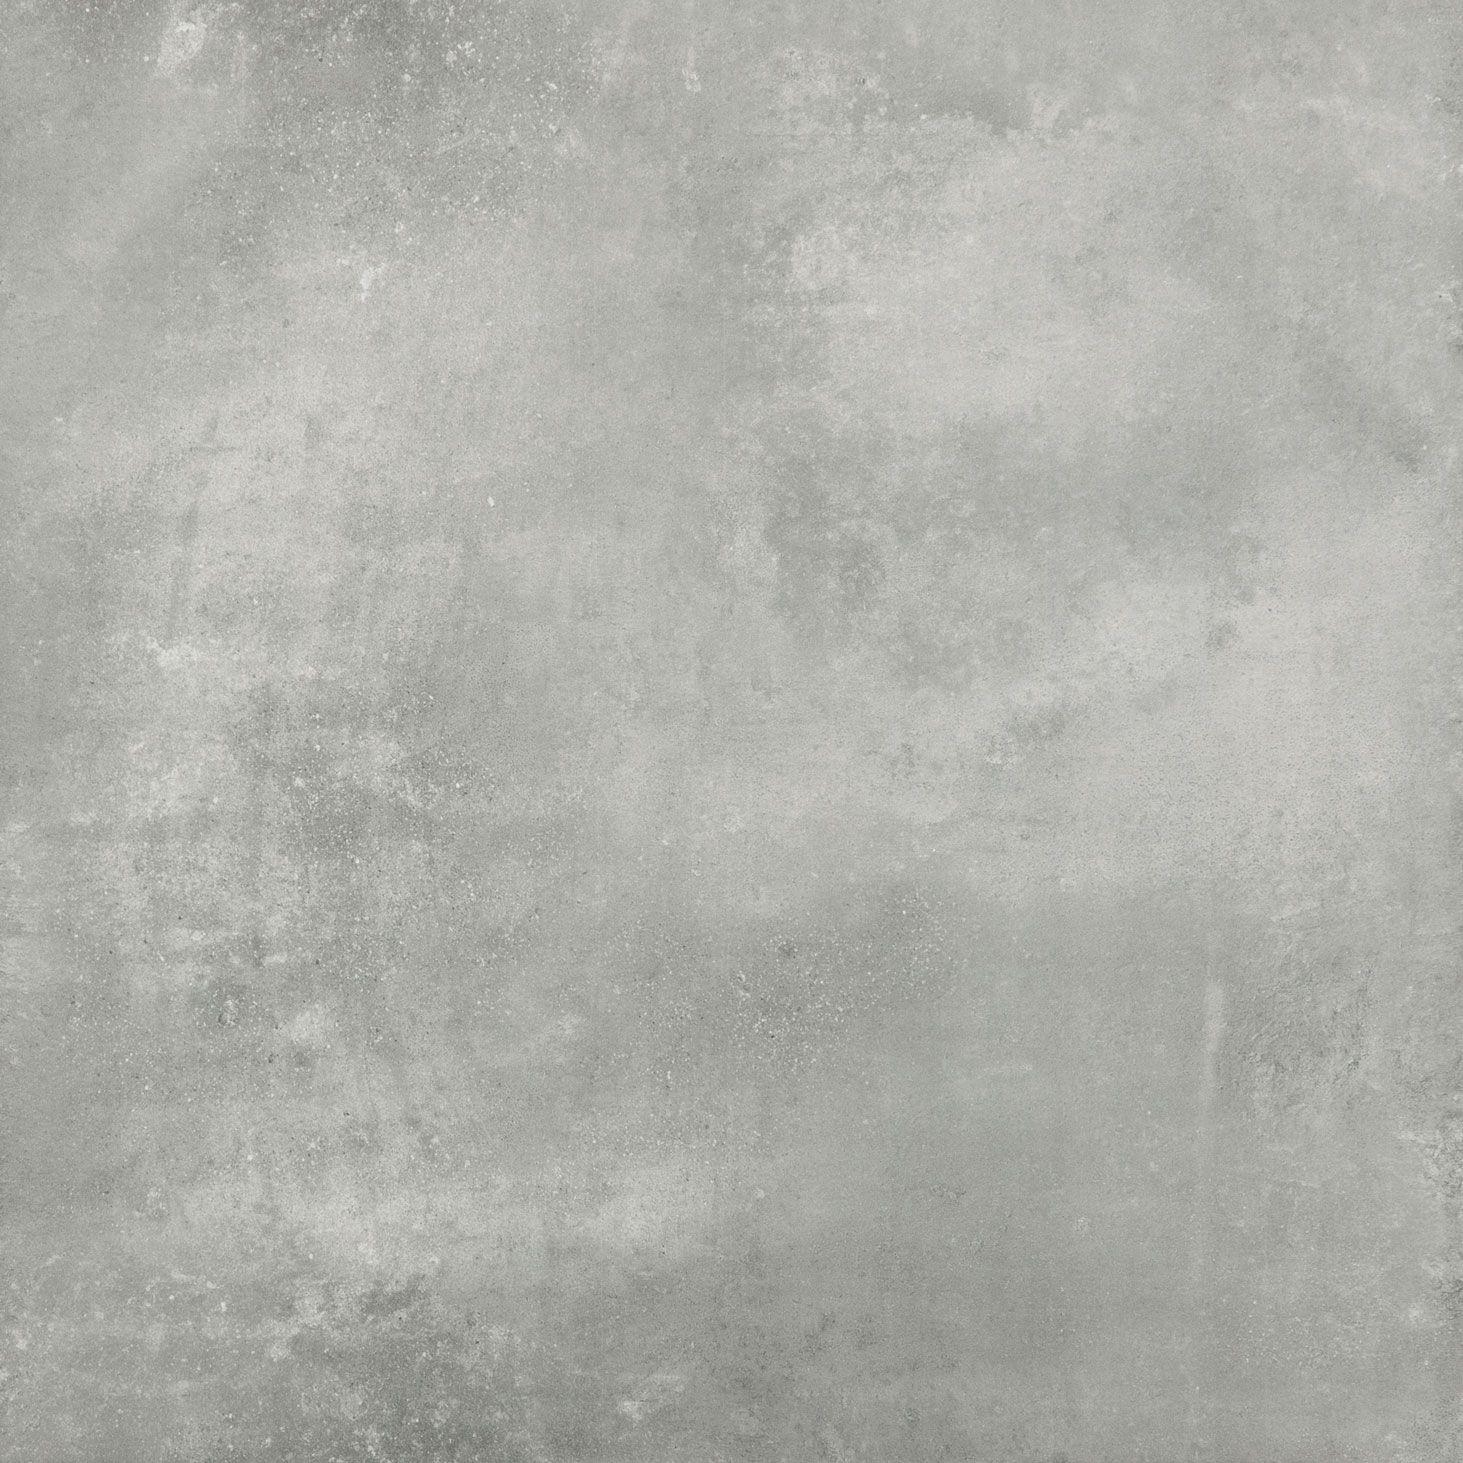 epoxy graphite 2 tub dzin 120 z m2 hall pinterest plancher epoxy sol beton et carrelage. Black Bedroom Furniture Sets. Home Design Ideas